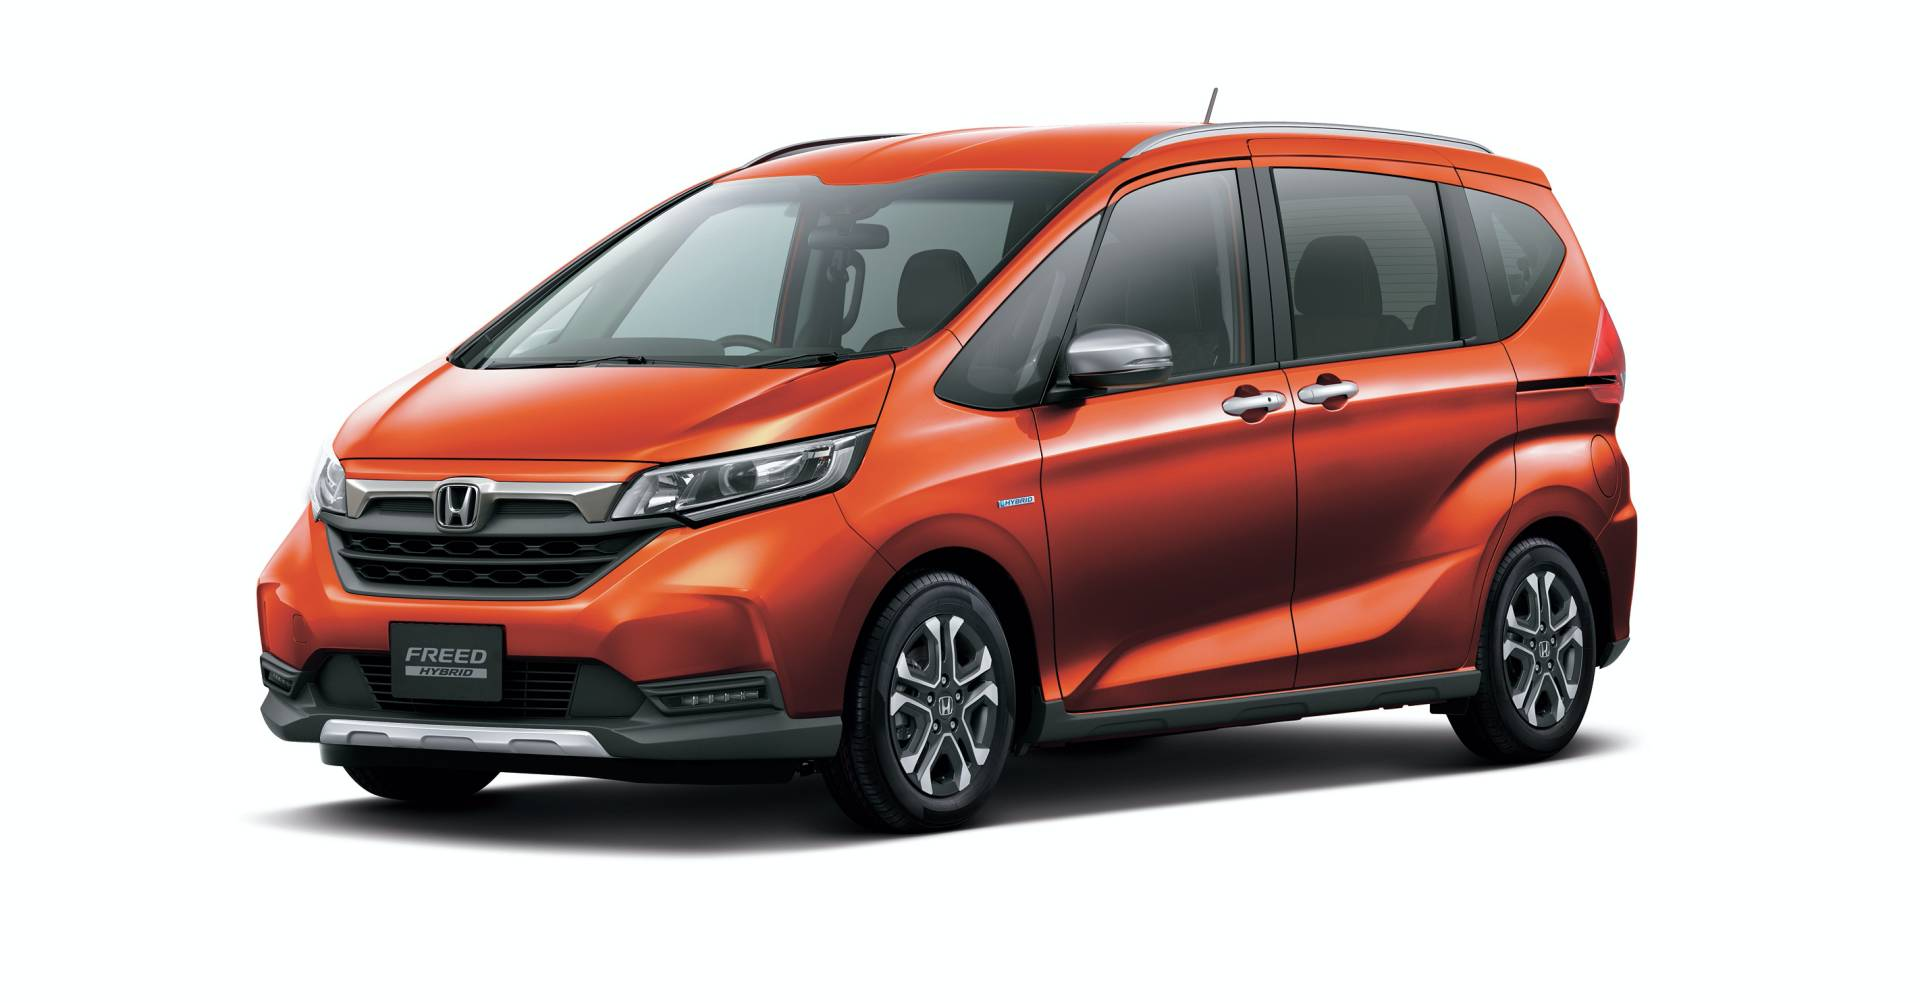 Honda-Freed-2020-5